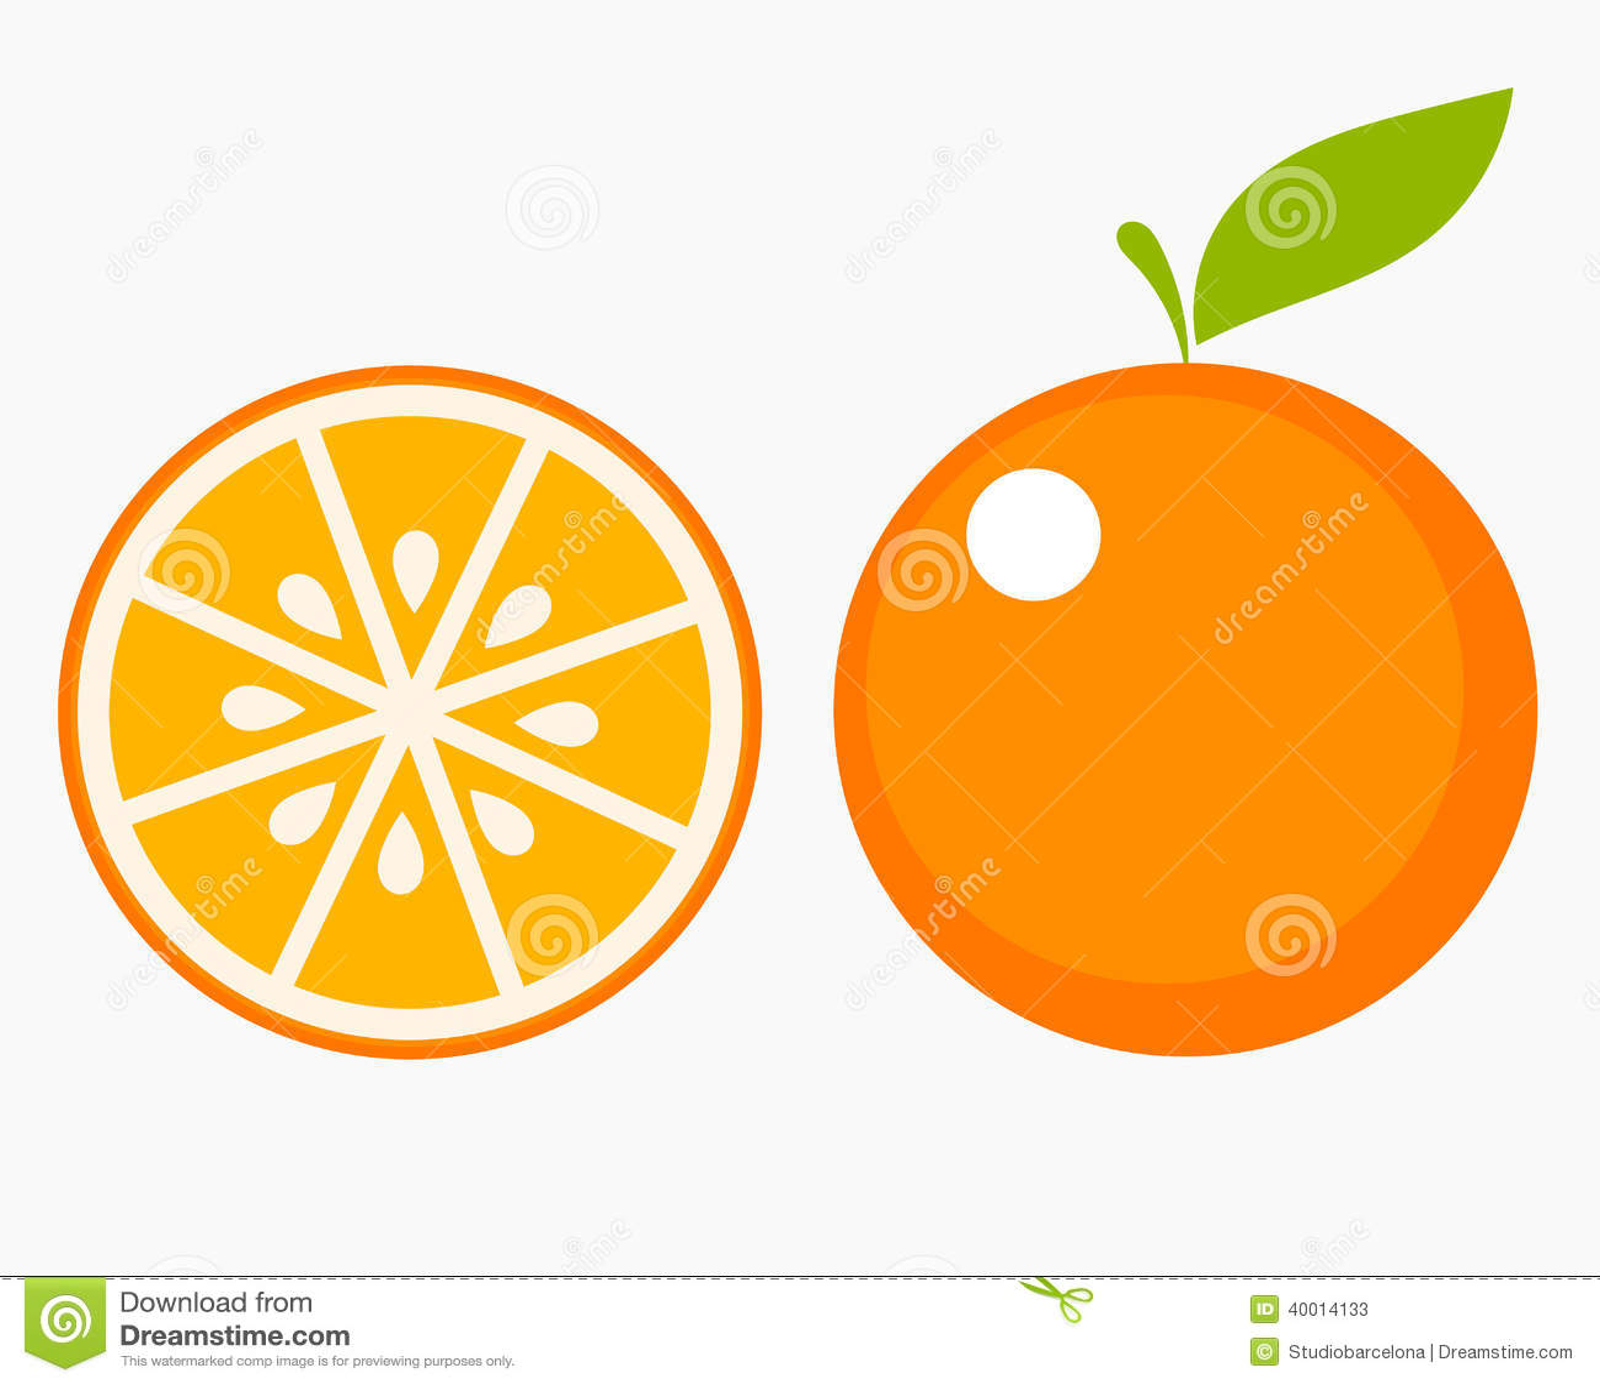 Orange Fruit Slice Stock Vector Illustration Of Abstract